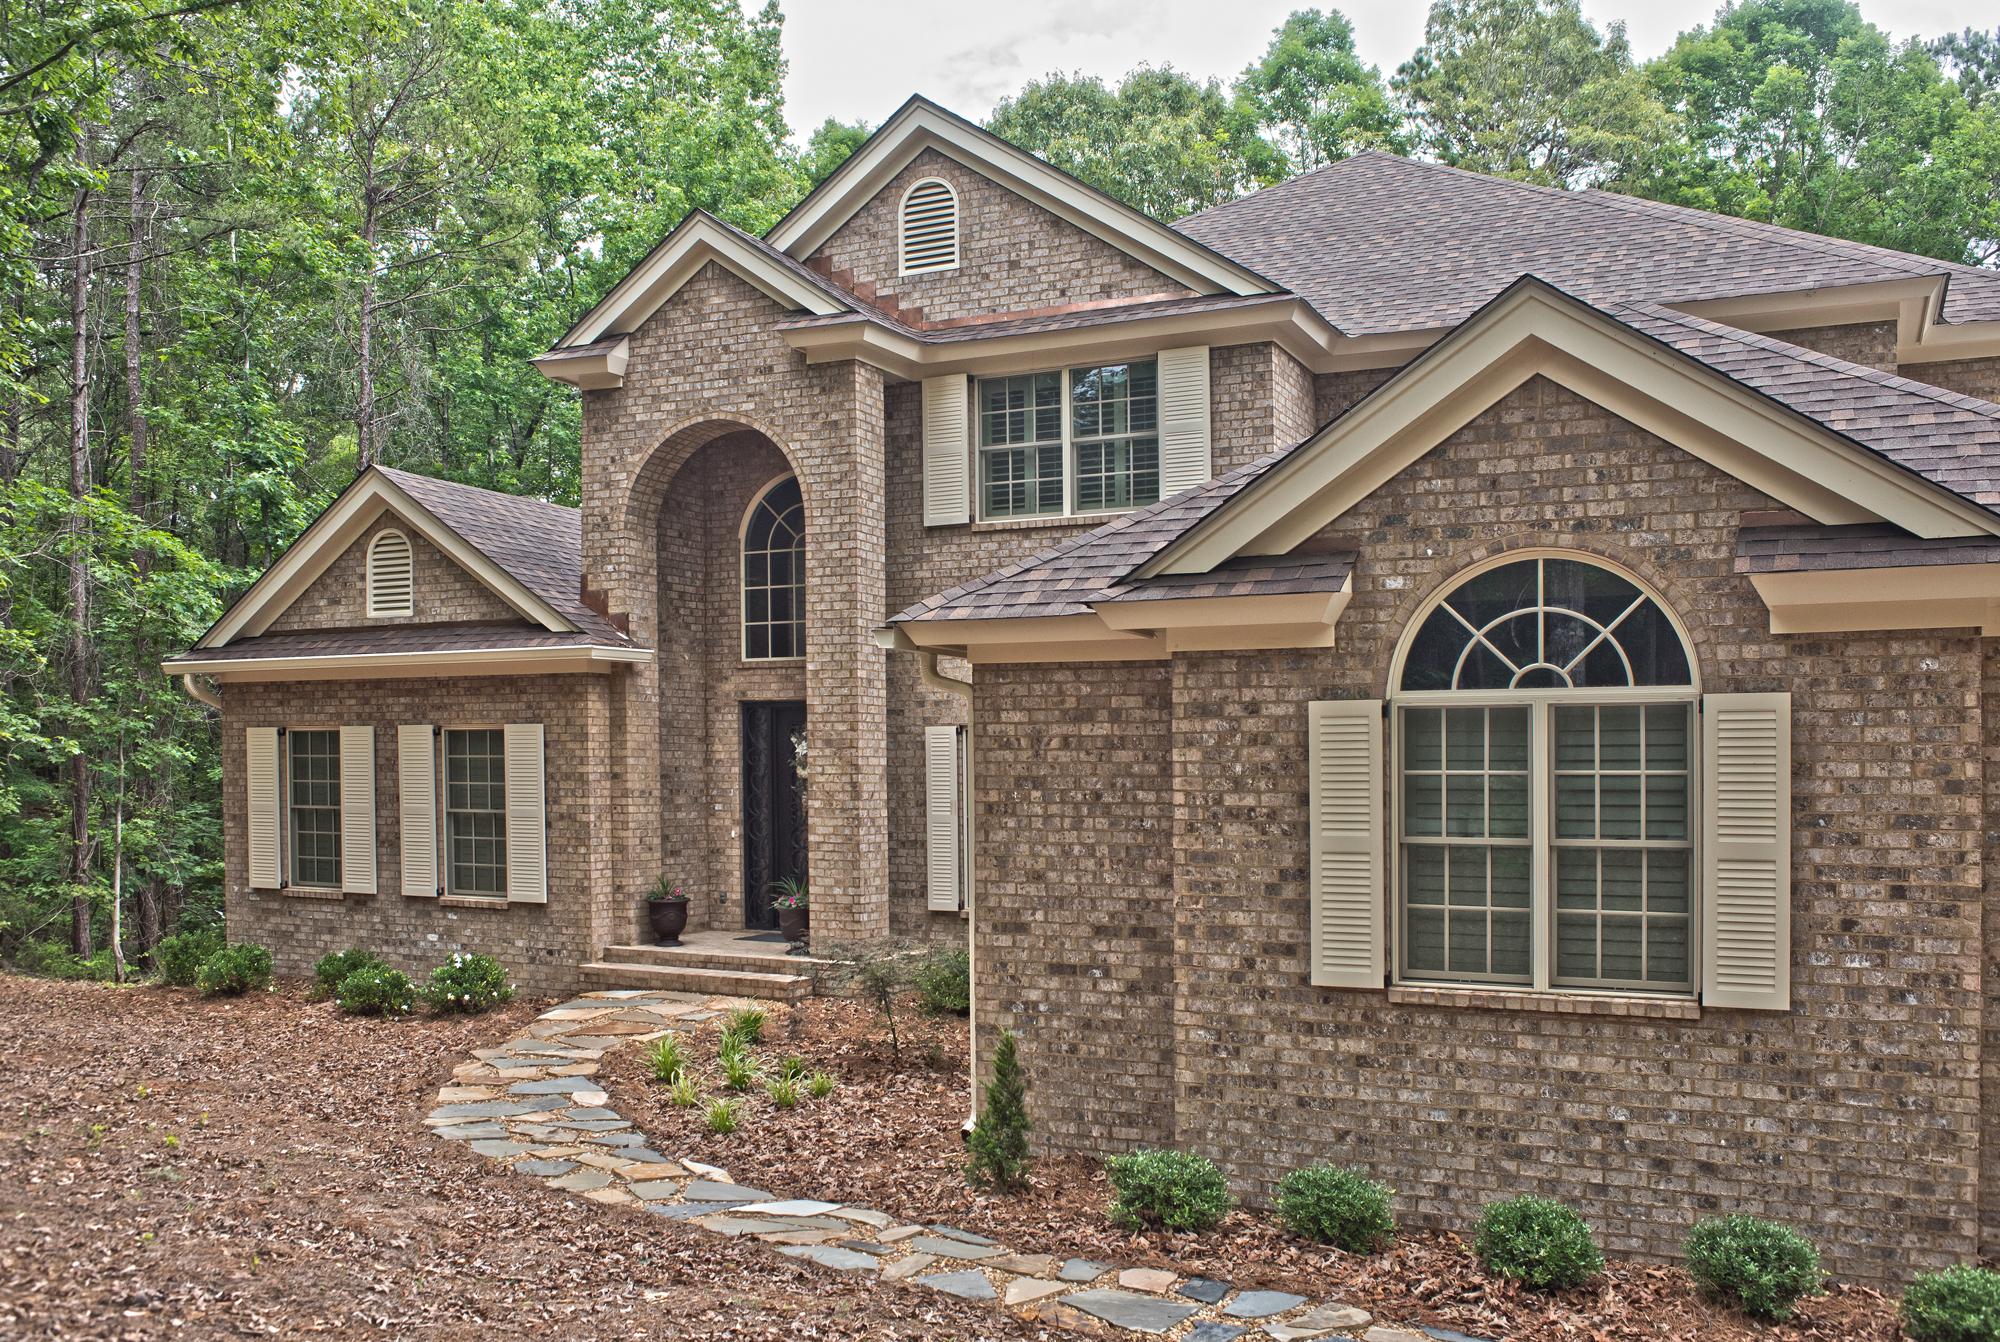 New brick home in Stillwater, AL